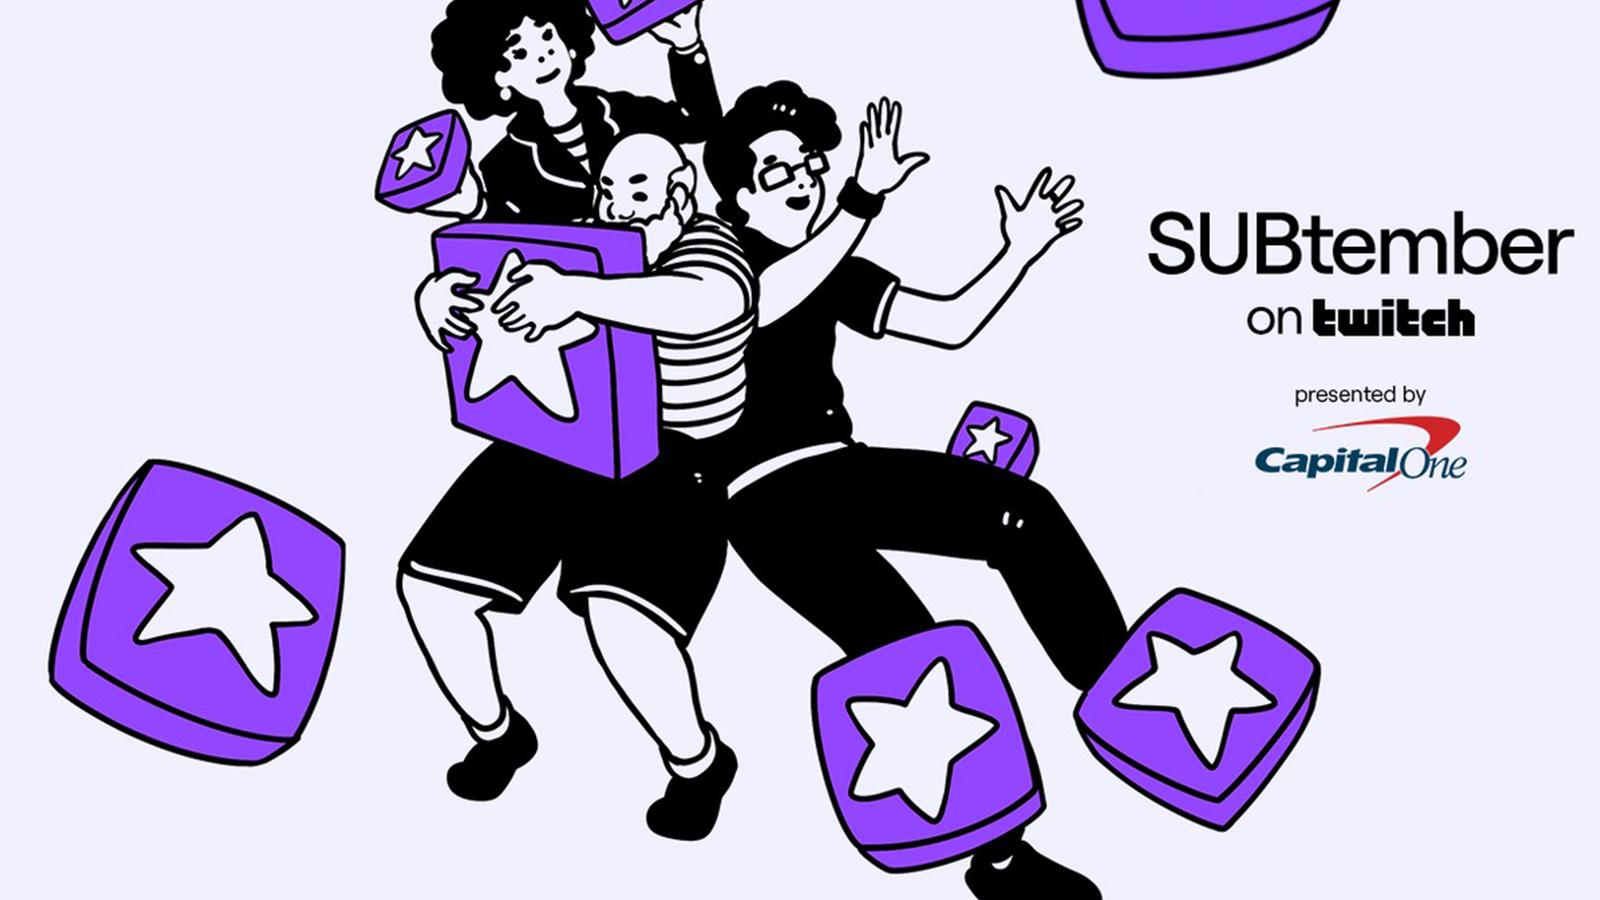 Evento subtember en Twitch